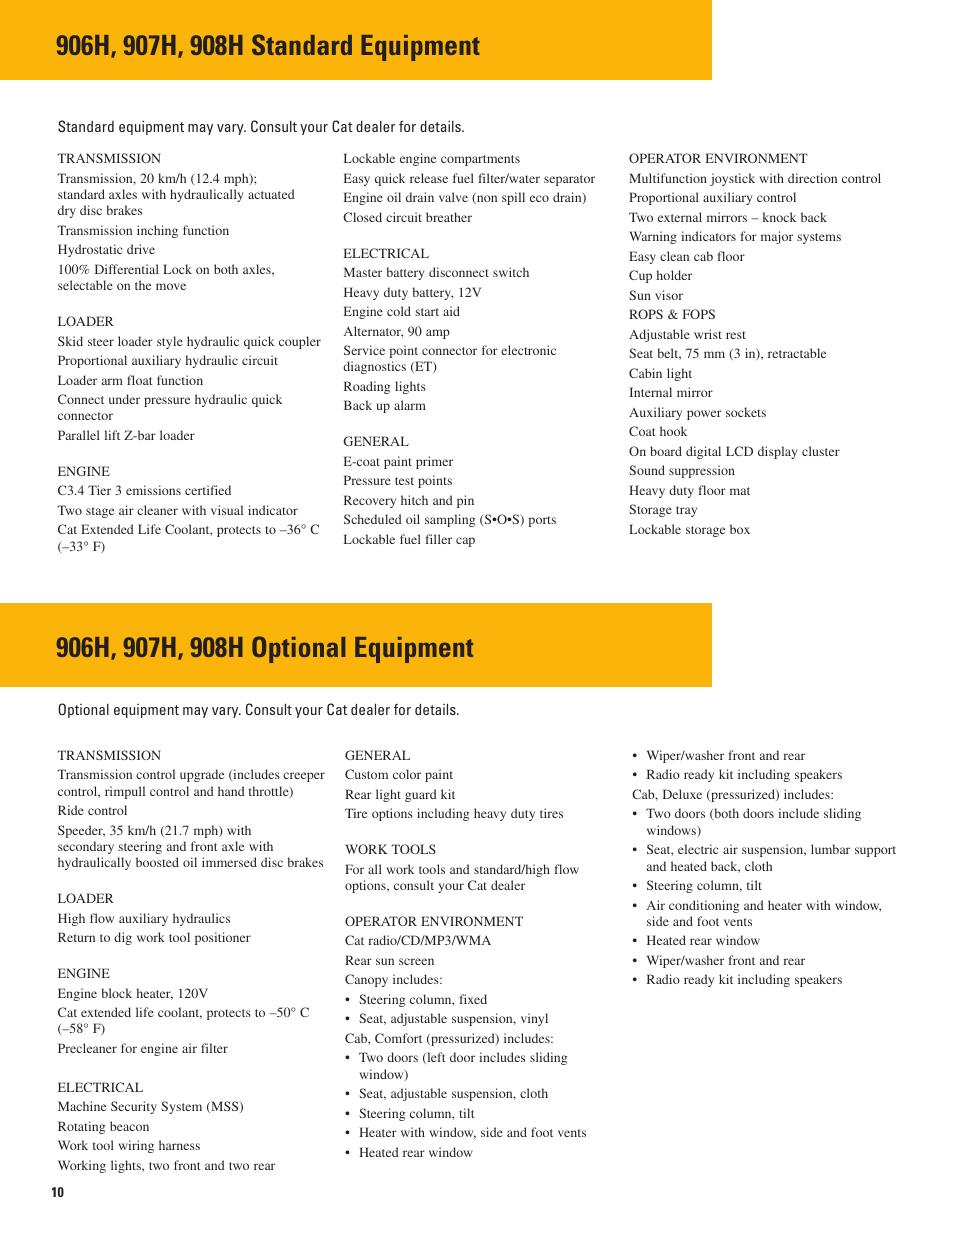 medium resolution of 906h 907h 908h standard equipment 906h 907h 908h optional equipment milton cat 908h user manual page 10 12